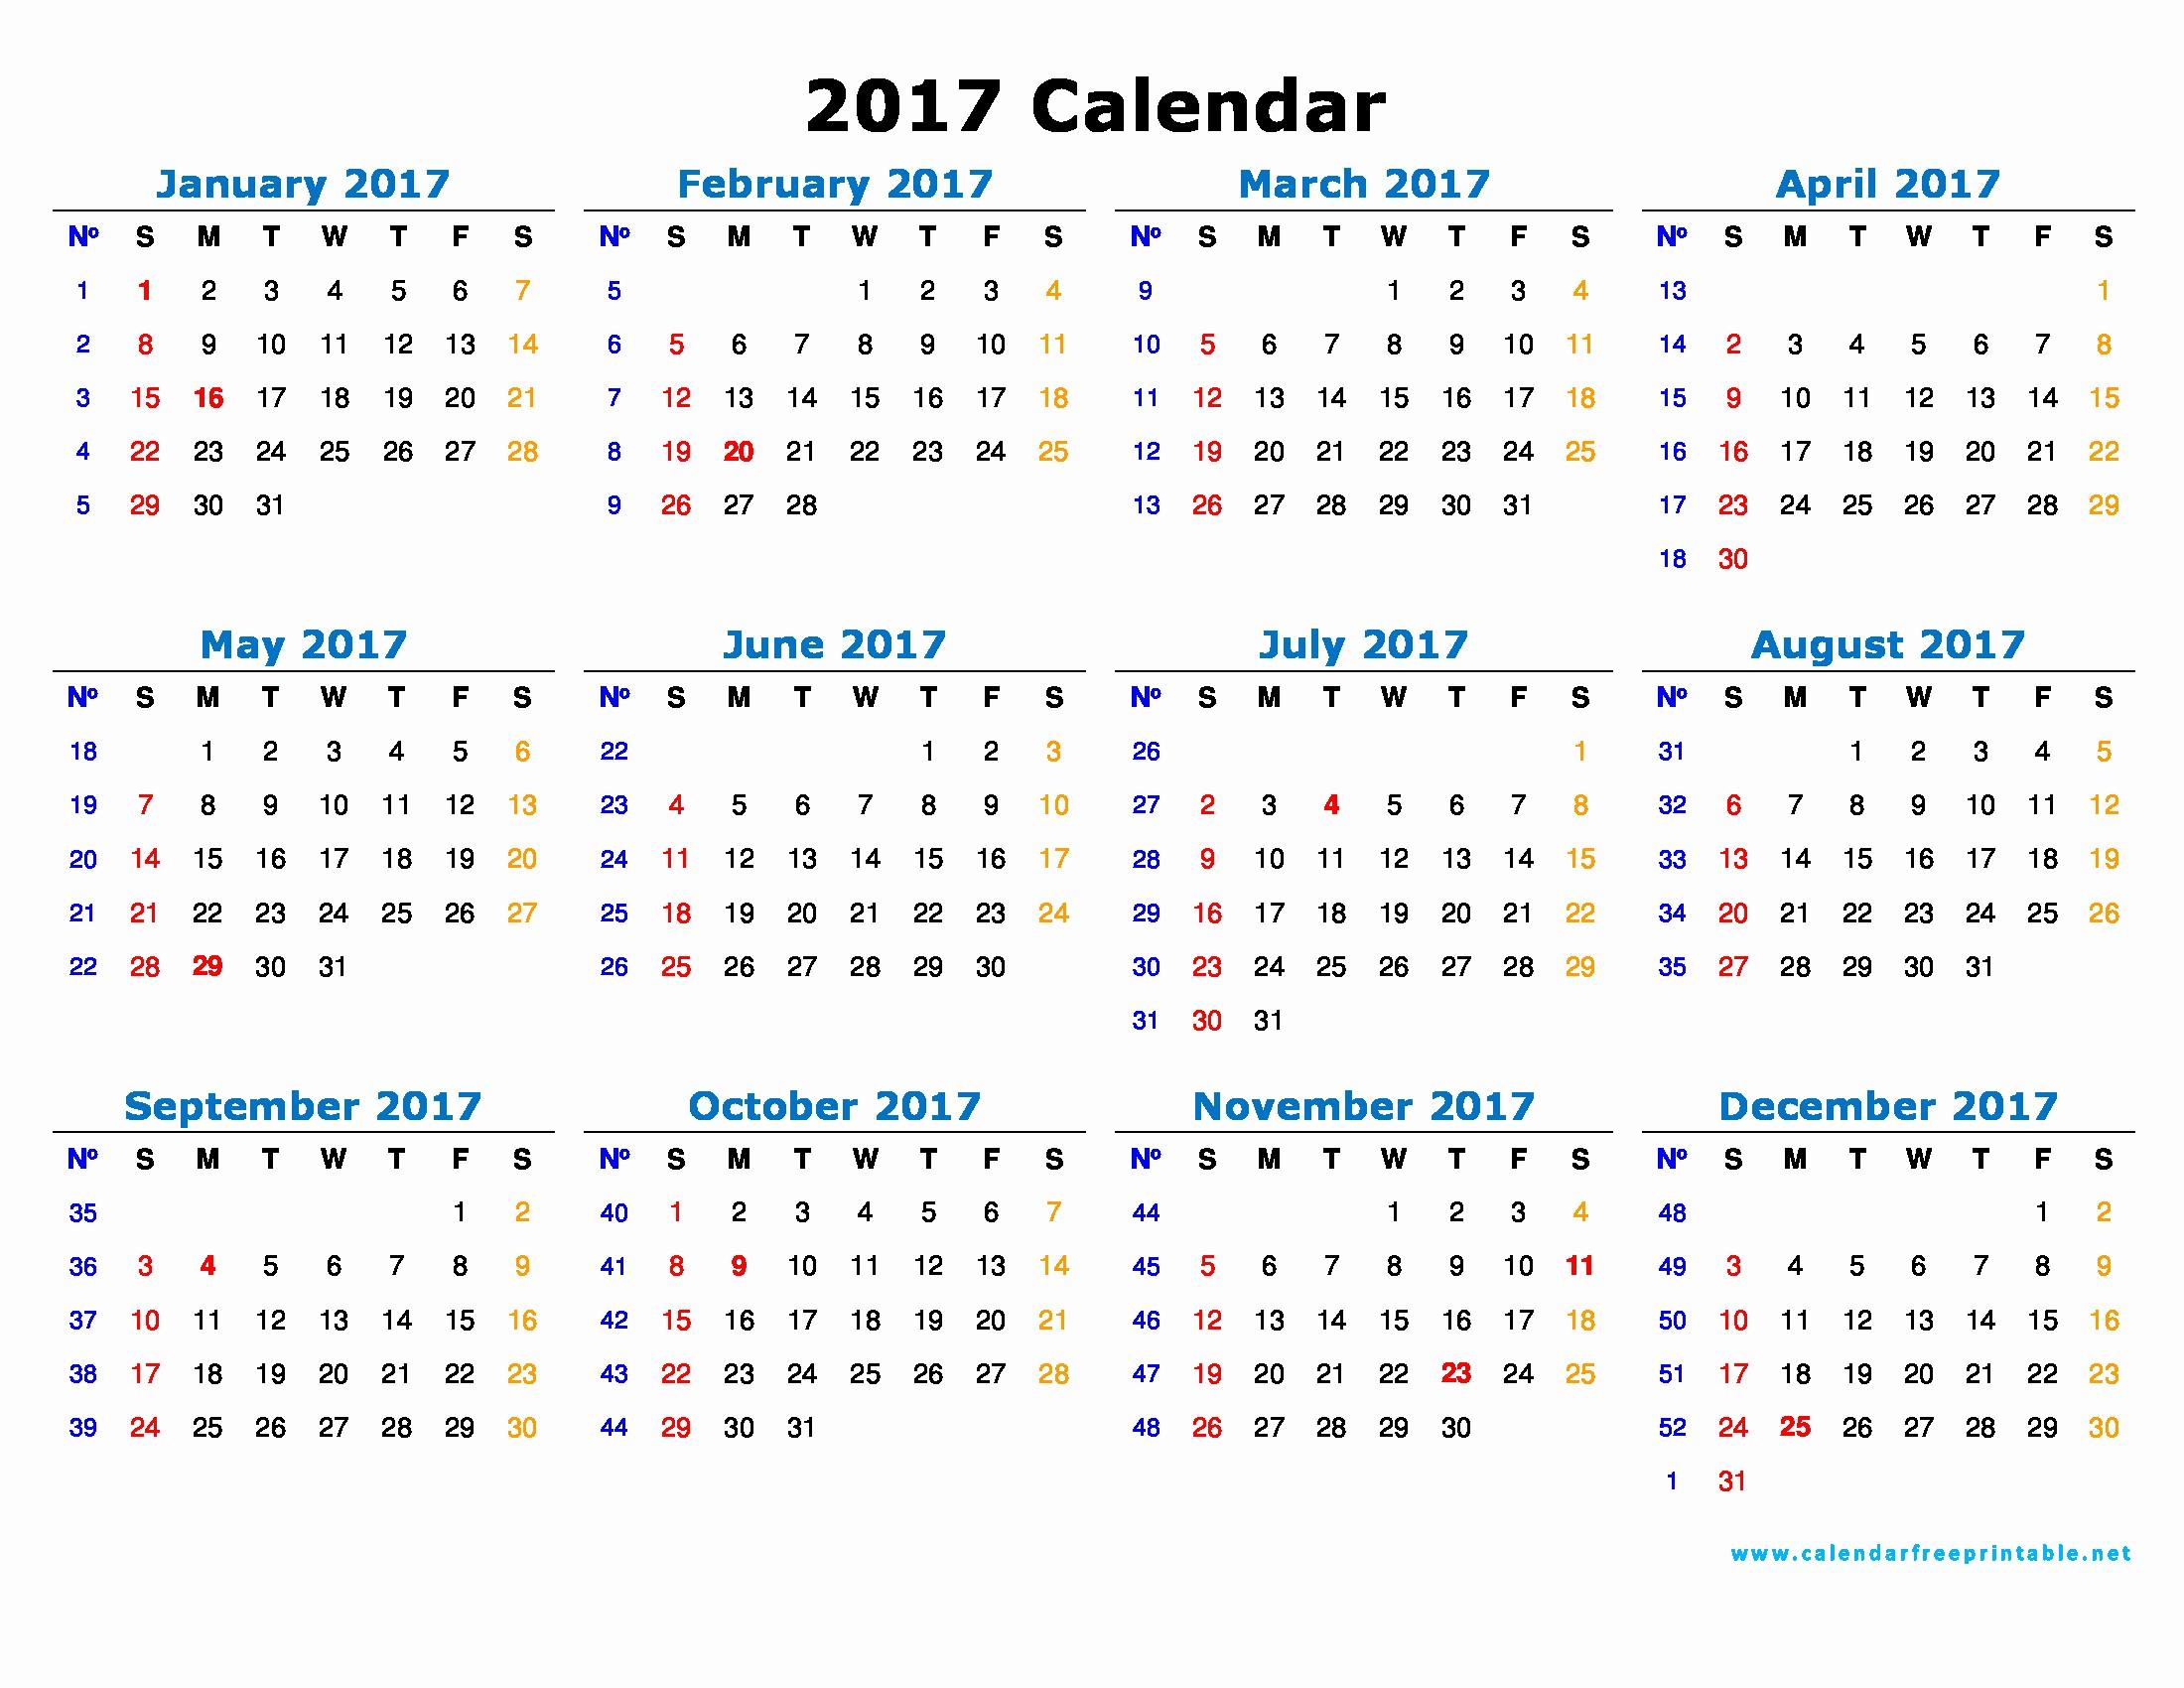 Free Printable Annual Calendar 2017 Inspirational 2017 Calendar Printable